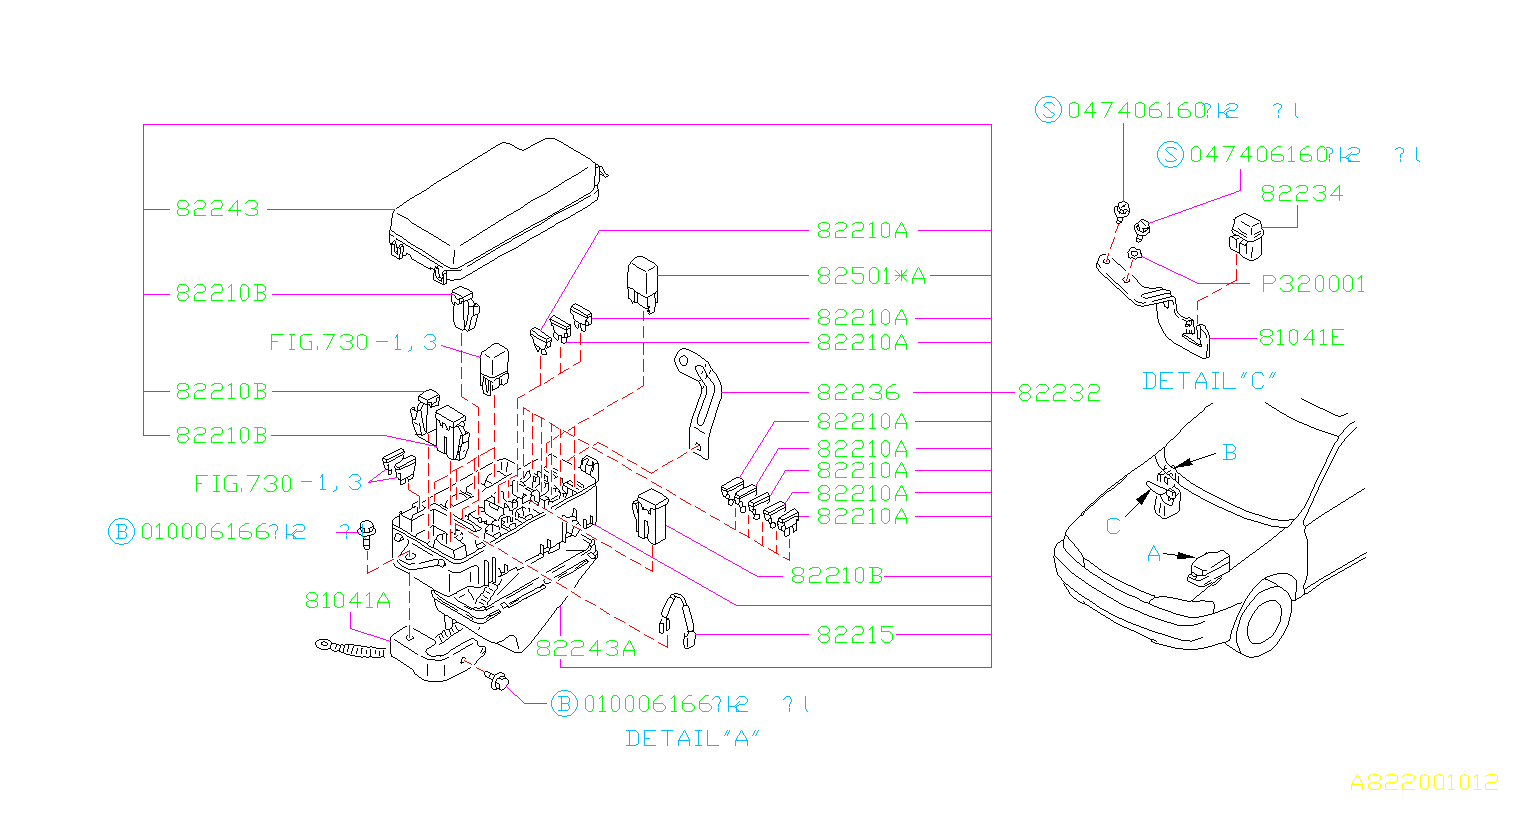 82233aa001 fuse main box electrical genuine subaru part. Black Bedroom Furniture Sets. Home Design Ideas